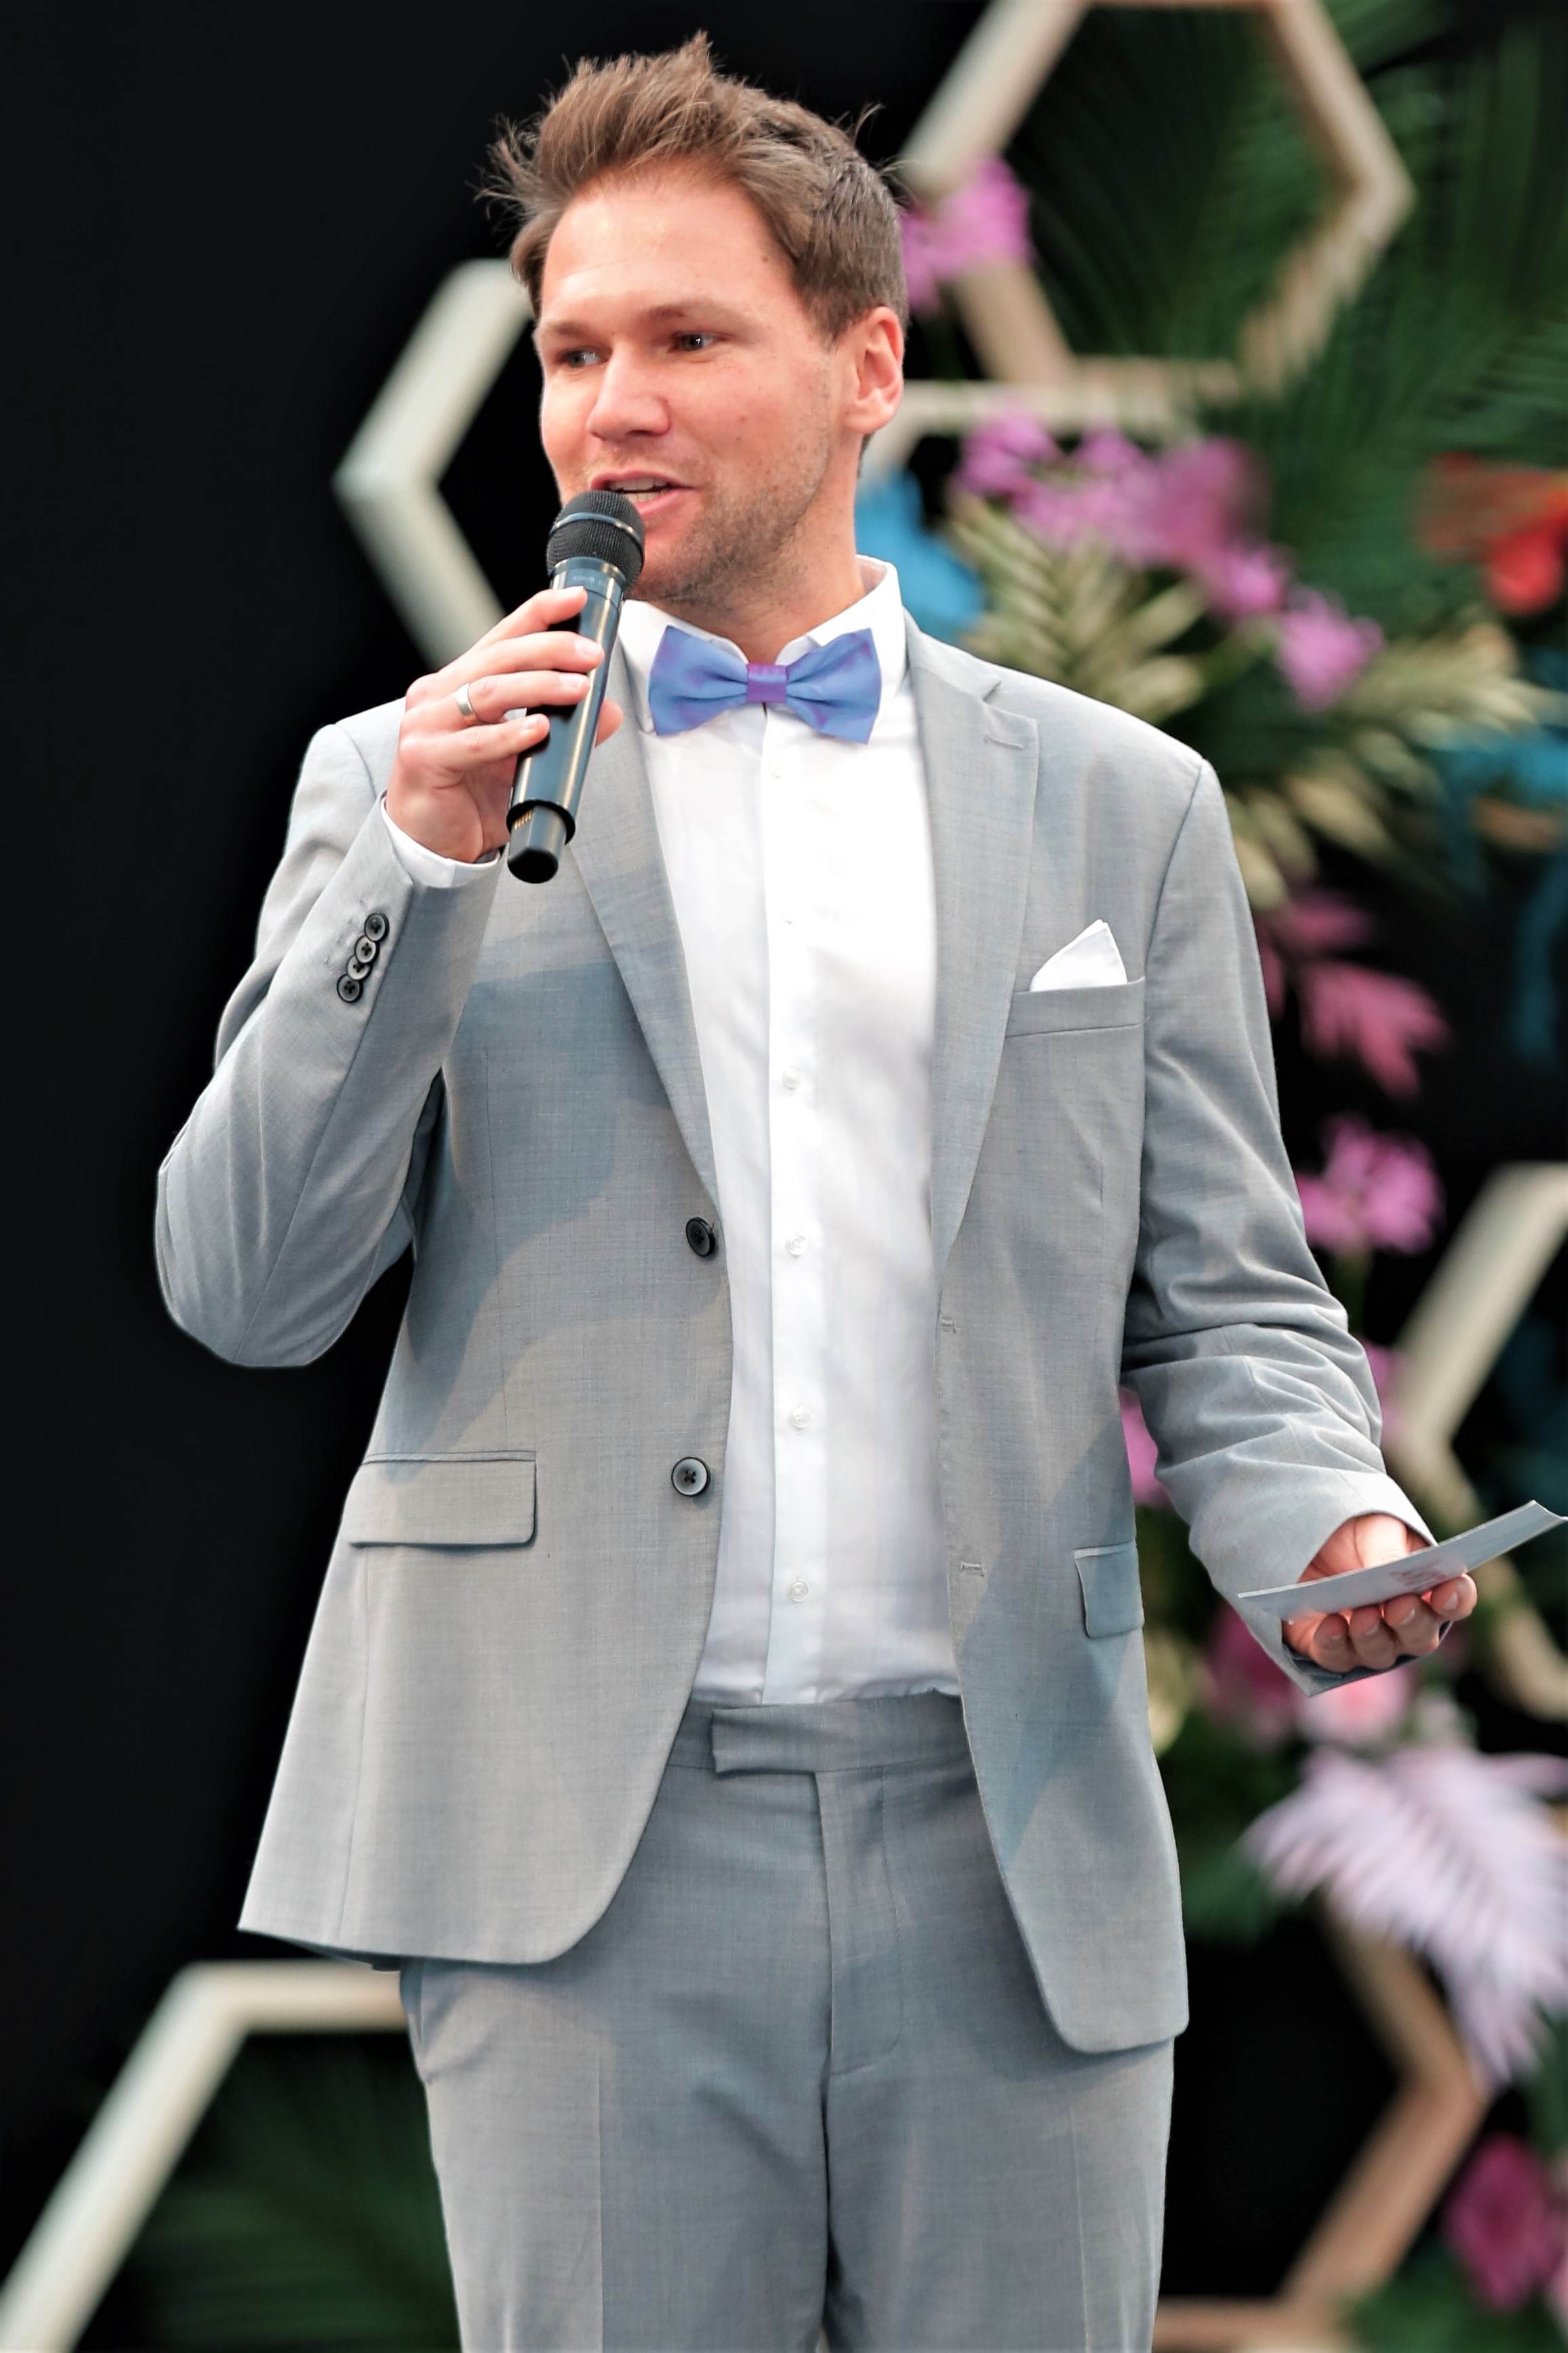 Moderator Mode Gala Modenshow Fashionshow Hochzeitsmesse Leipzig Tobias Witton Host